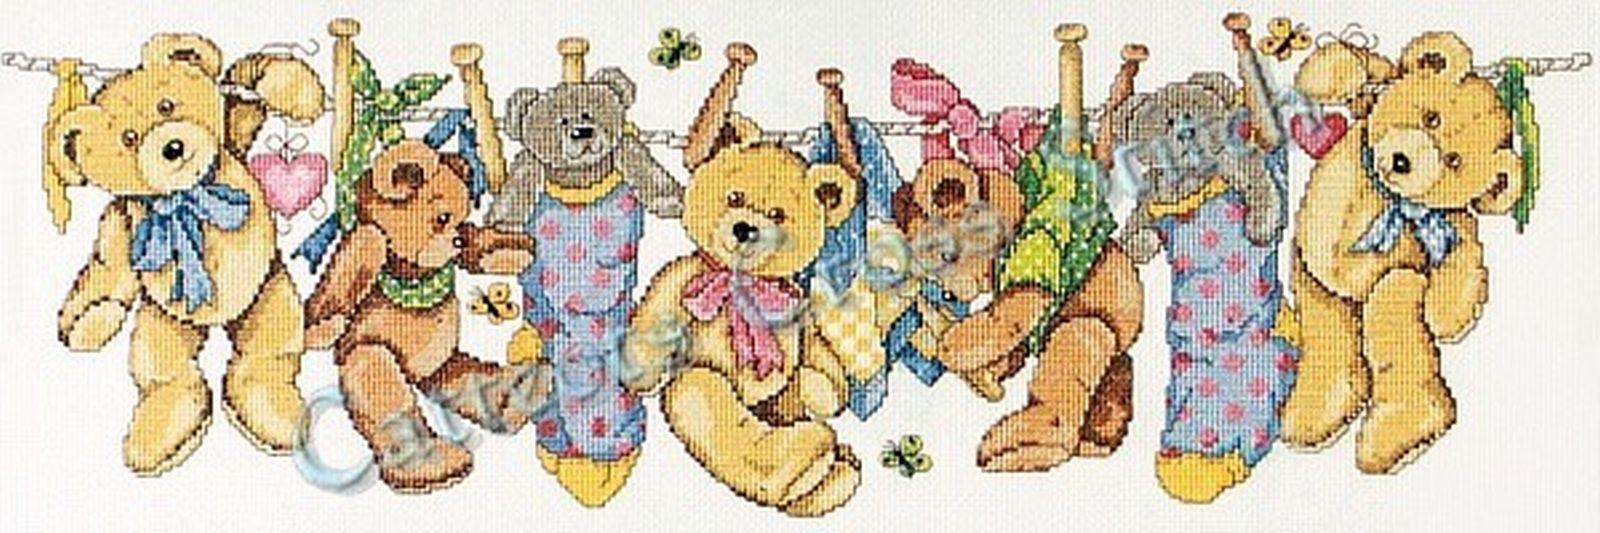 Cross Stitch Pattern Teddies On The Line Teddy Bears 28906032277 Ebay